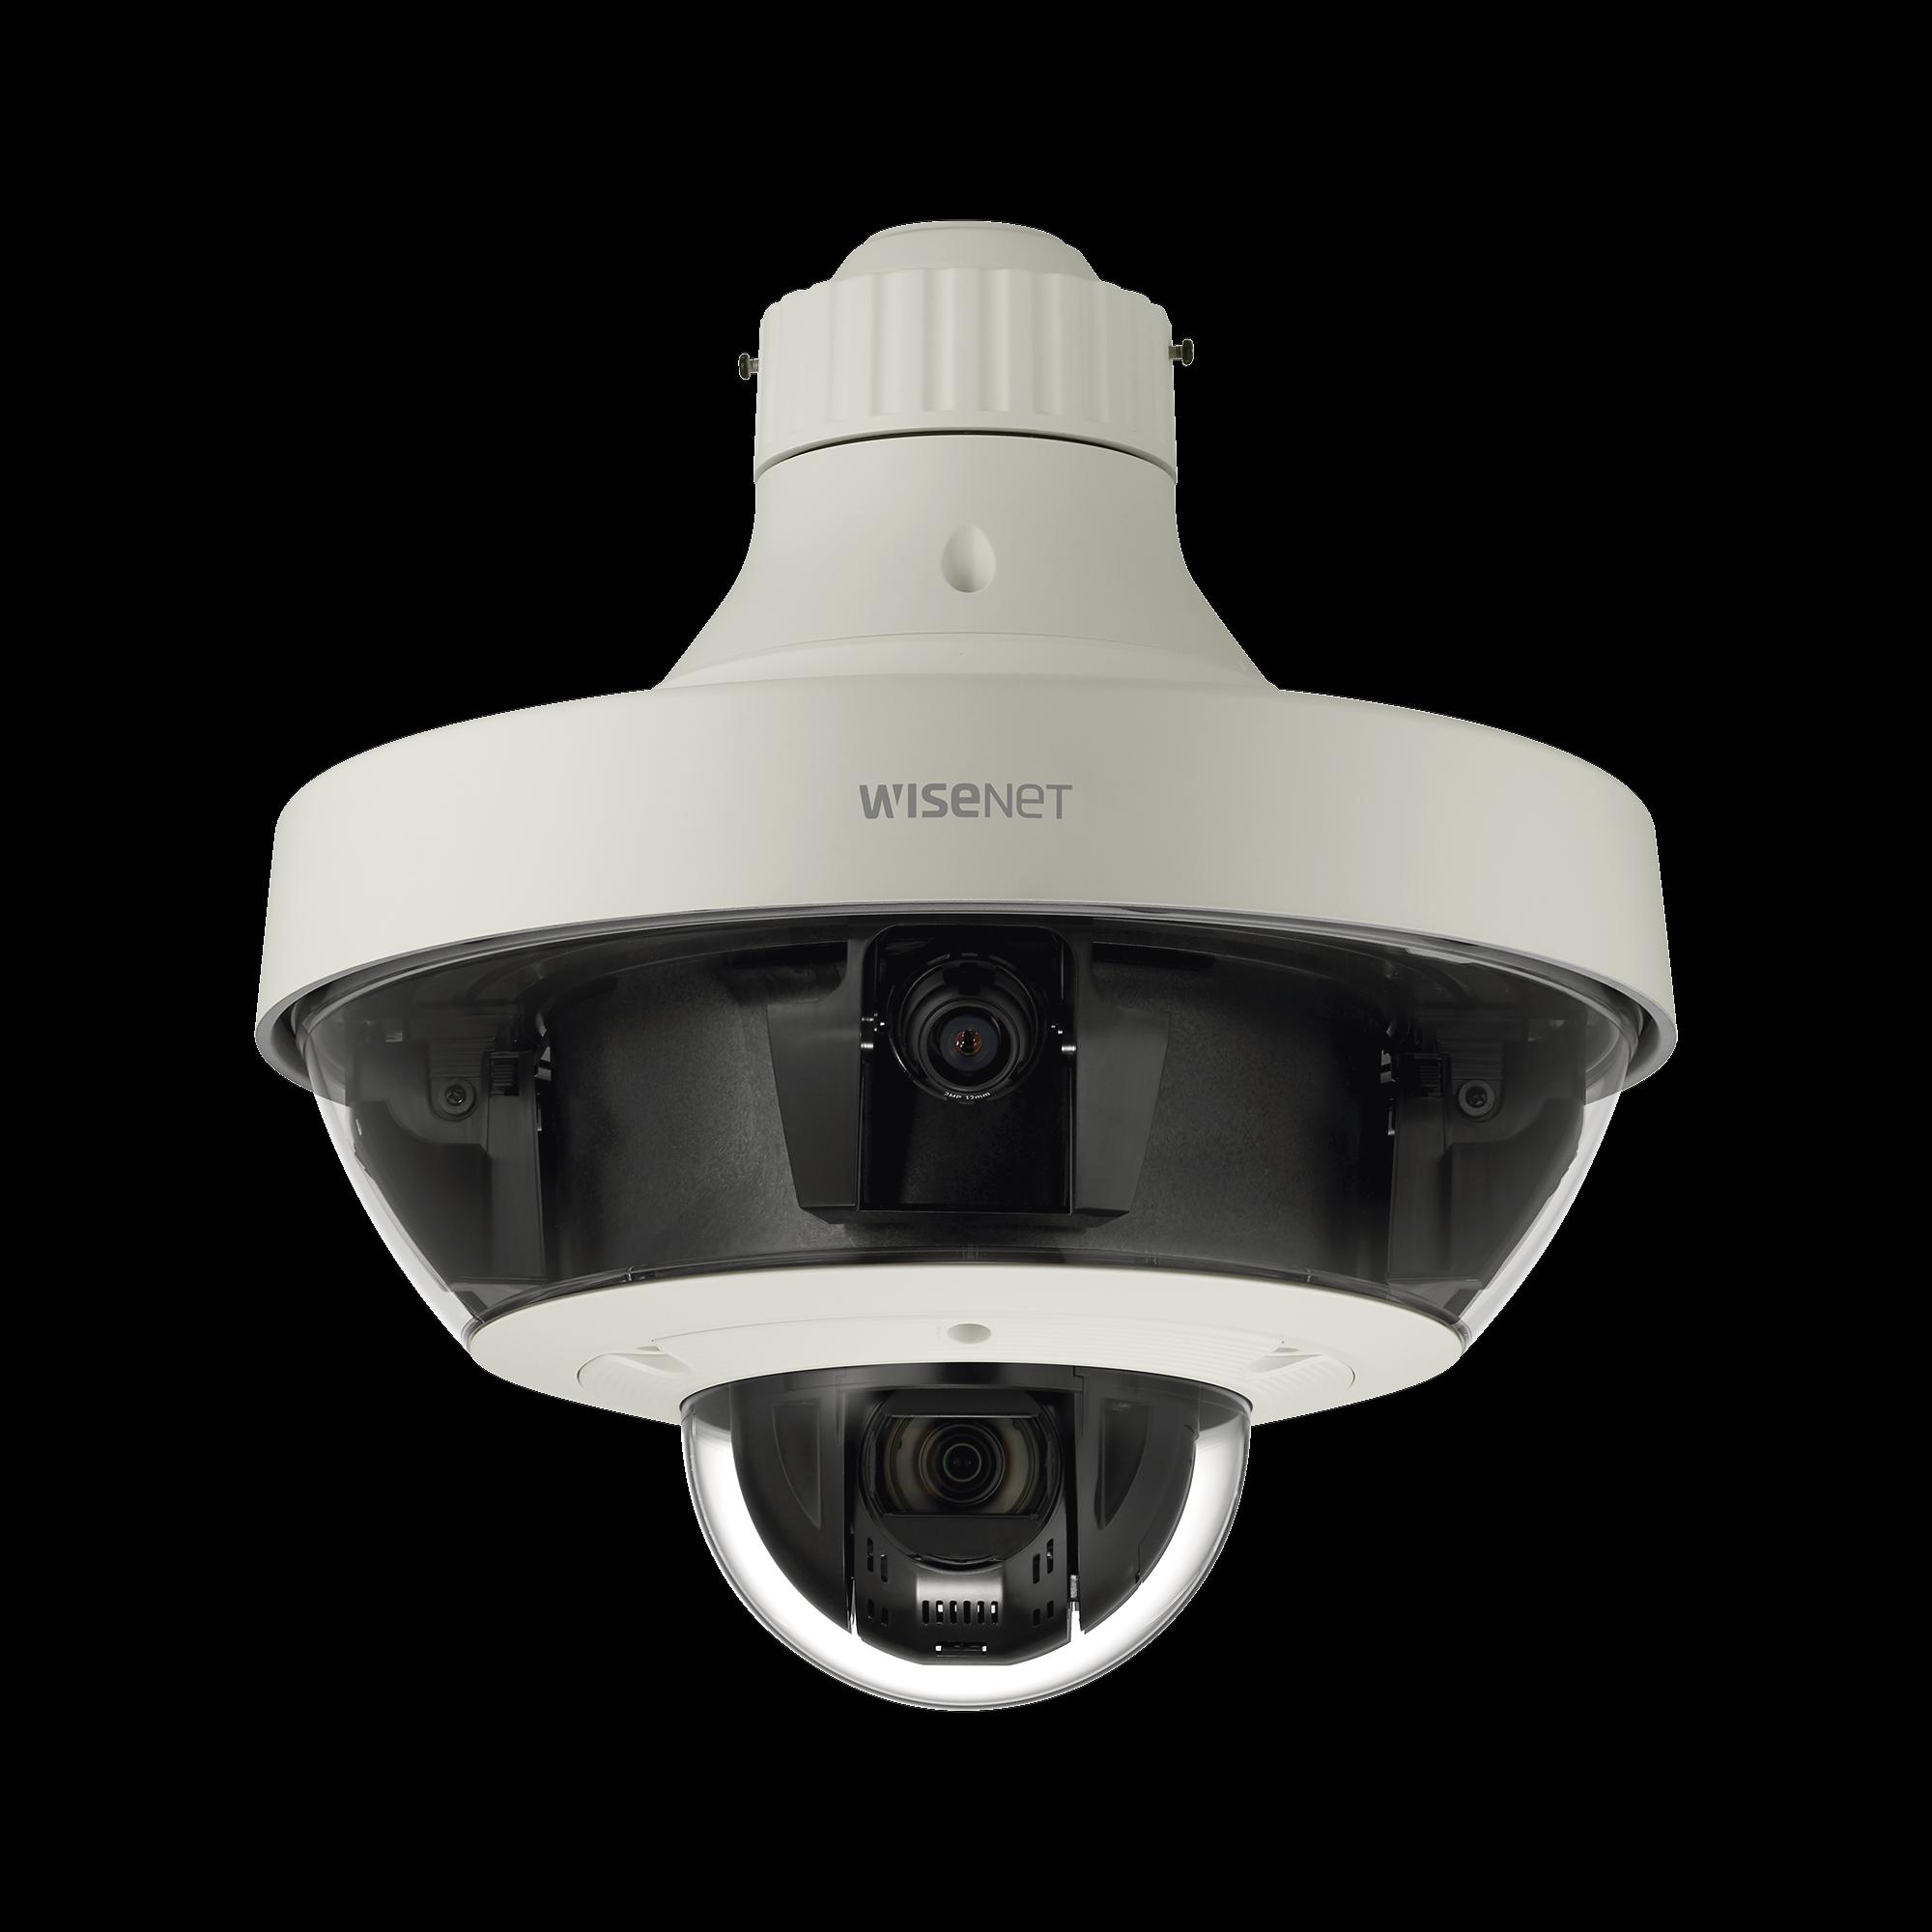 Cámara IP Multisensor 8 - 20 MP (4 sensores de 2 o 5 MP) lentes intercambiables con PTZ 2 MP 32X / Hasta 5 tarjetas SD de 256 GB / WDR de hasta 150dB / IP66 / IK10